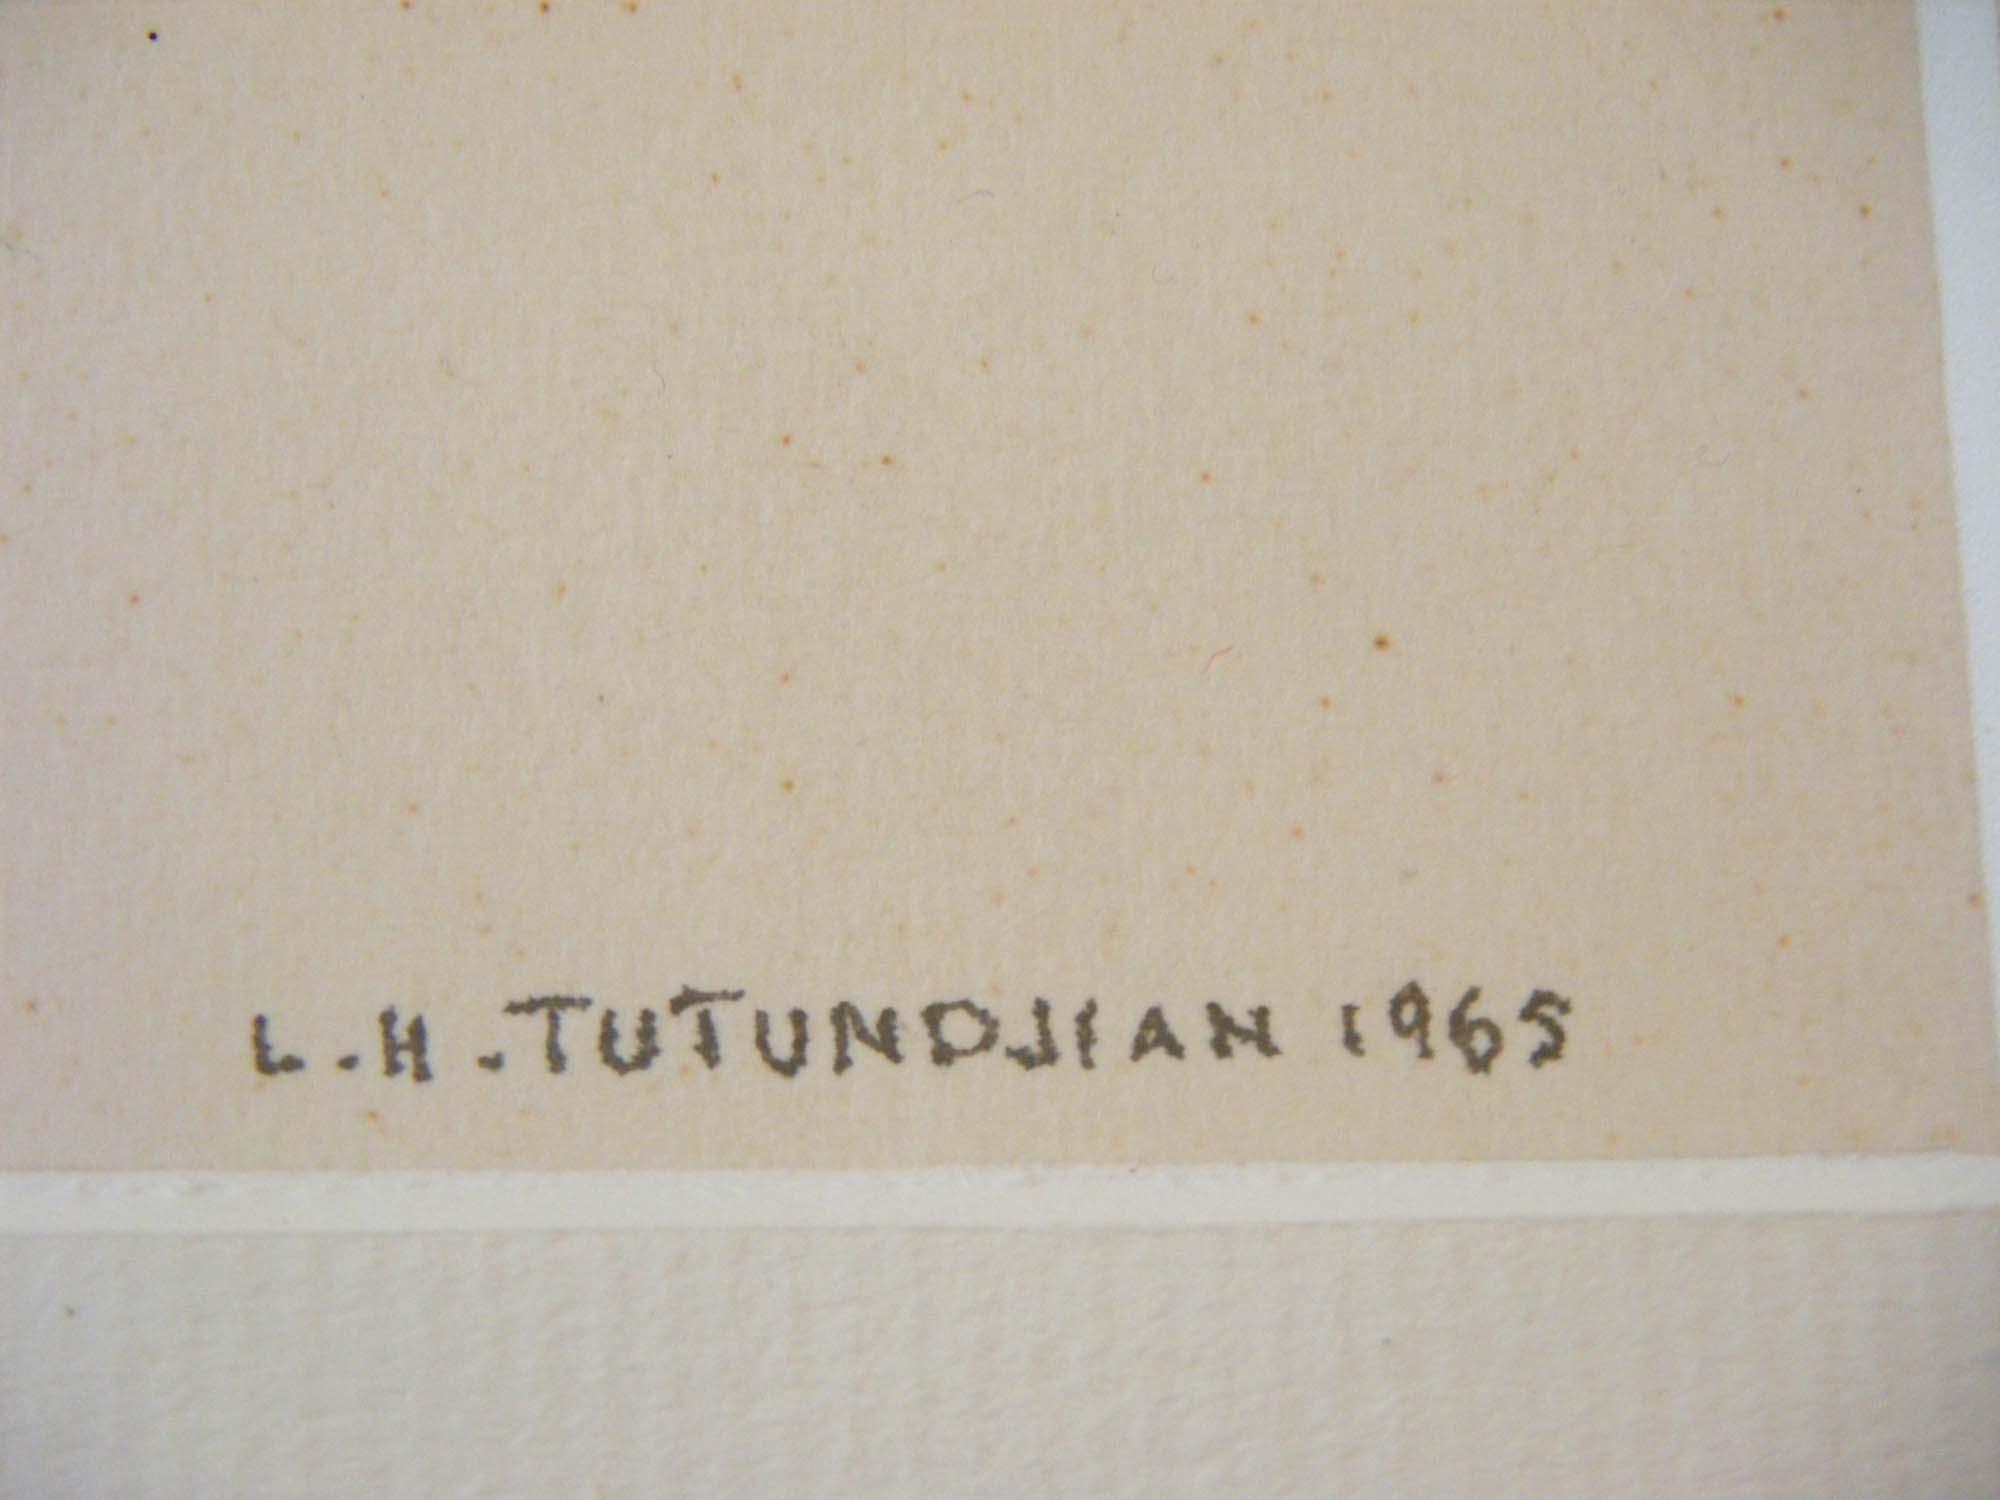 Signature Léon Arthur Tutundjian